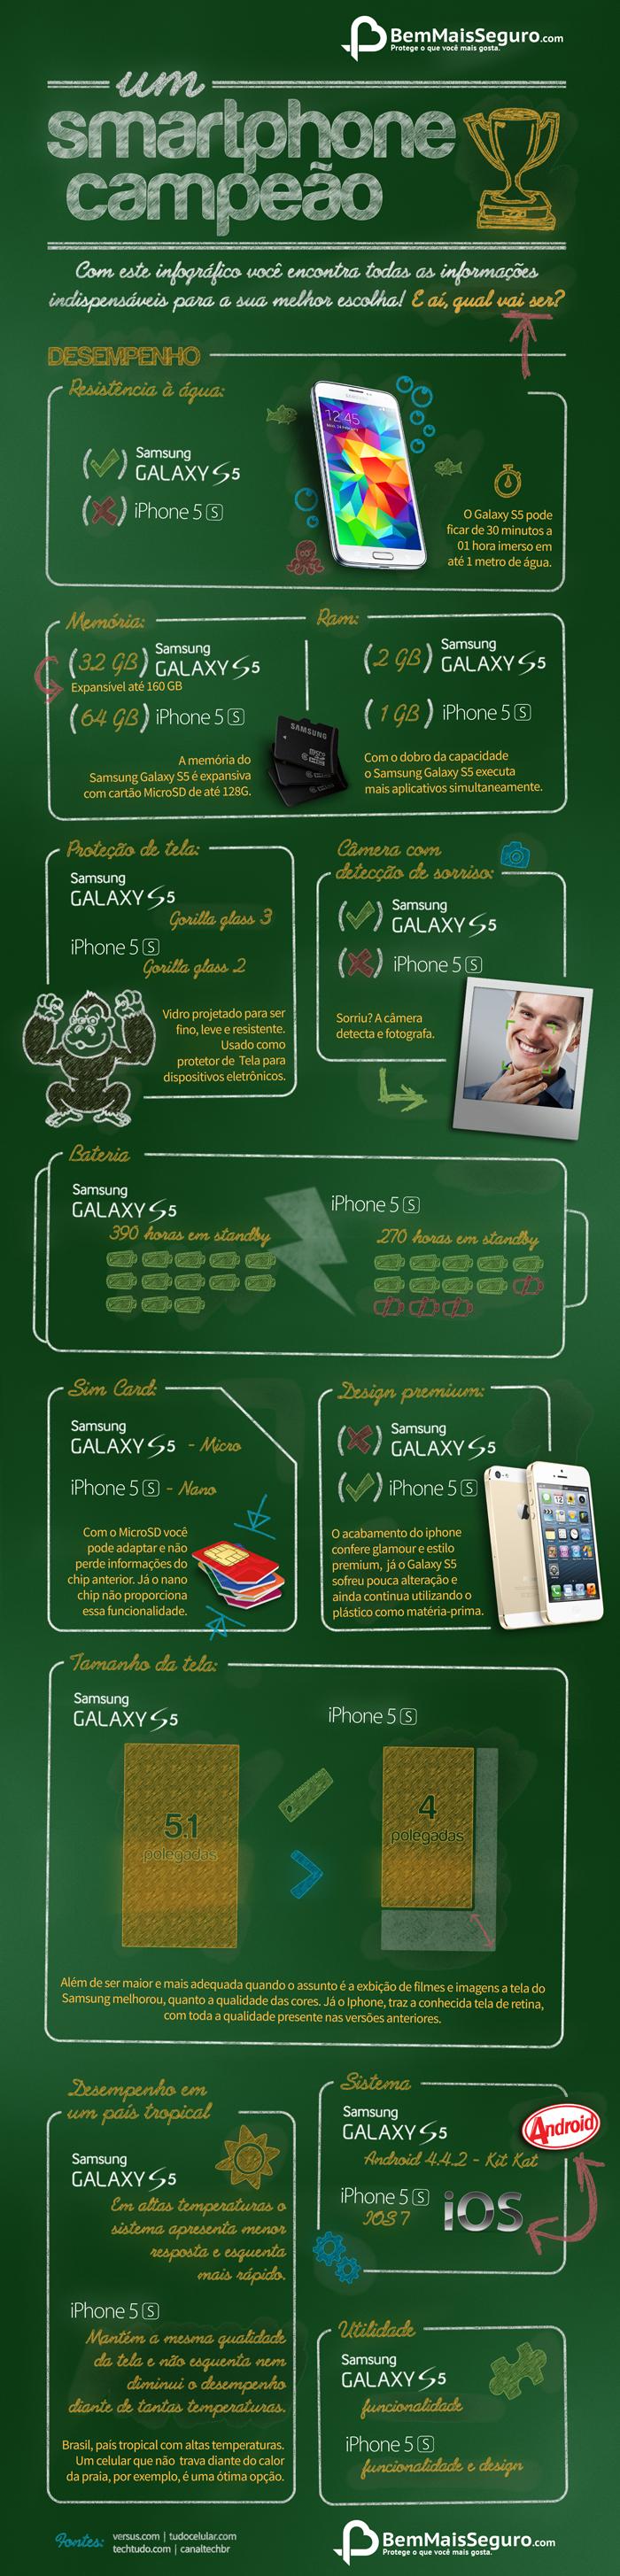 GalaxyS5 ou iPhone 5S